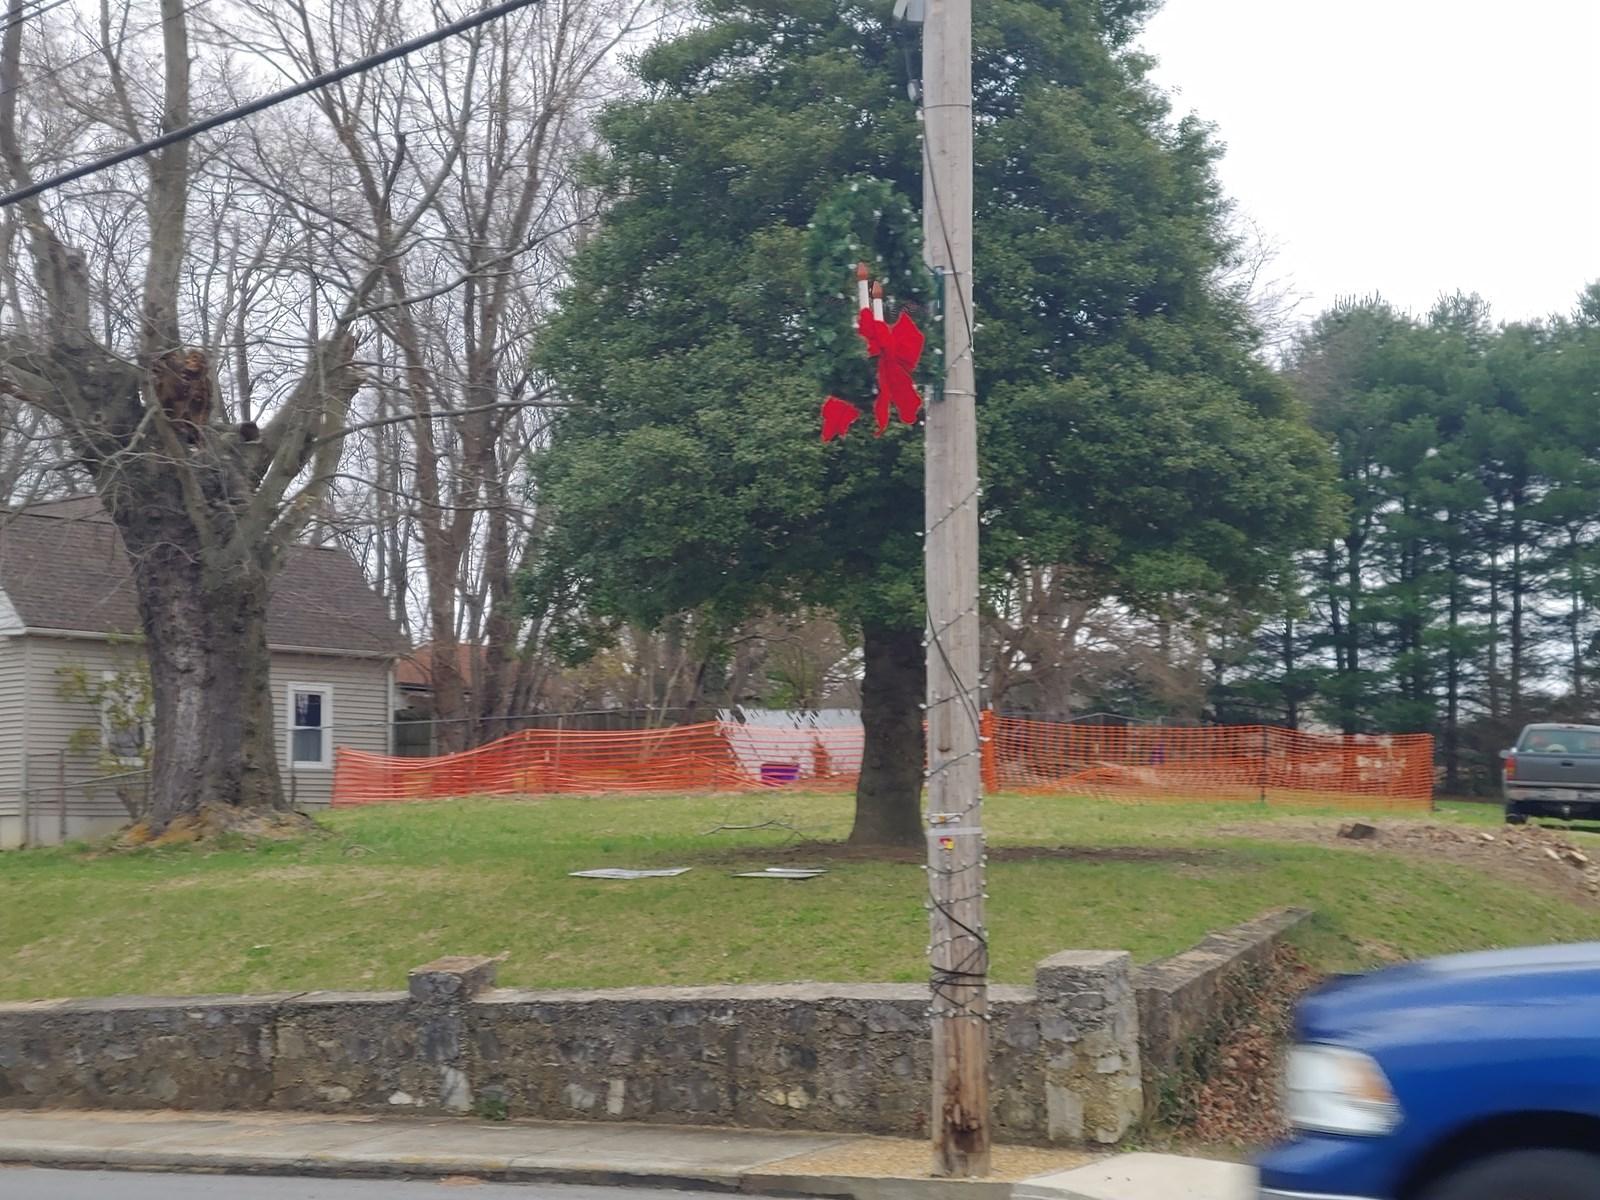 Land for Sale in Christiansburg VA